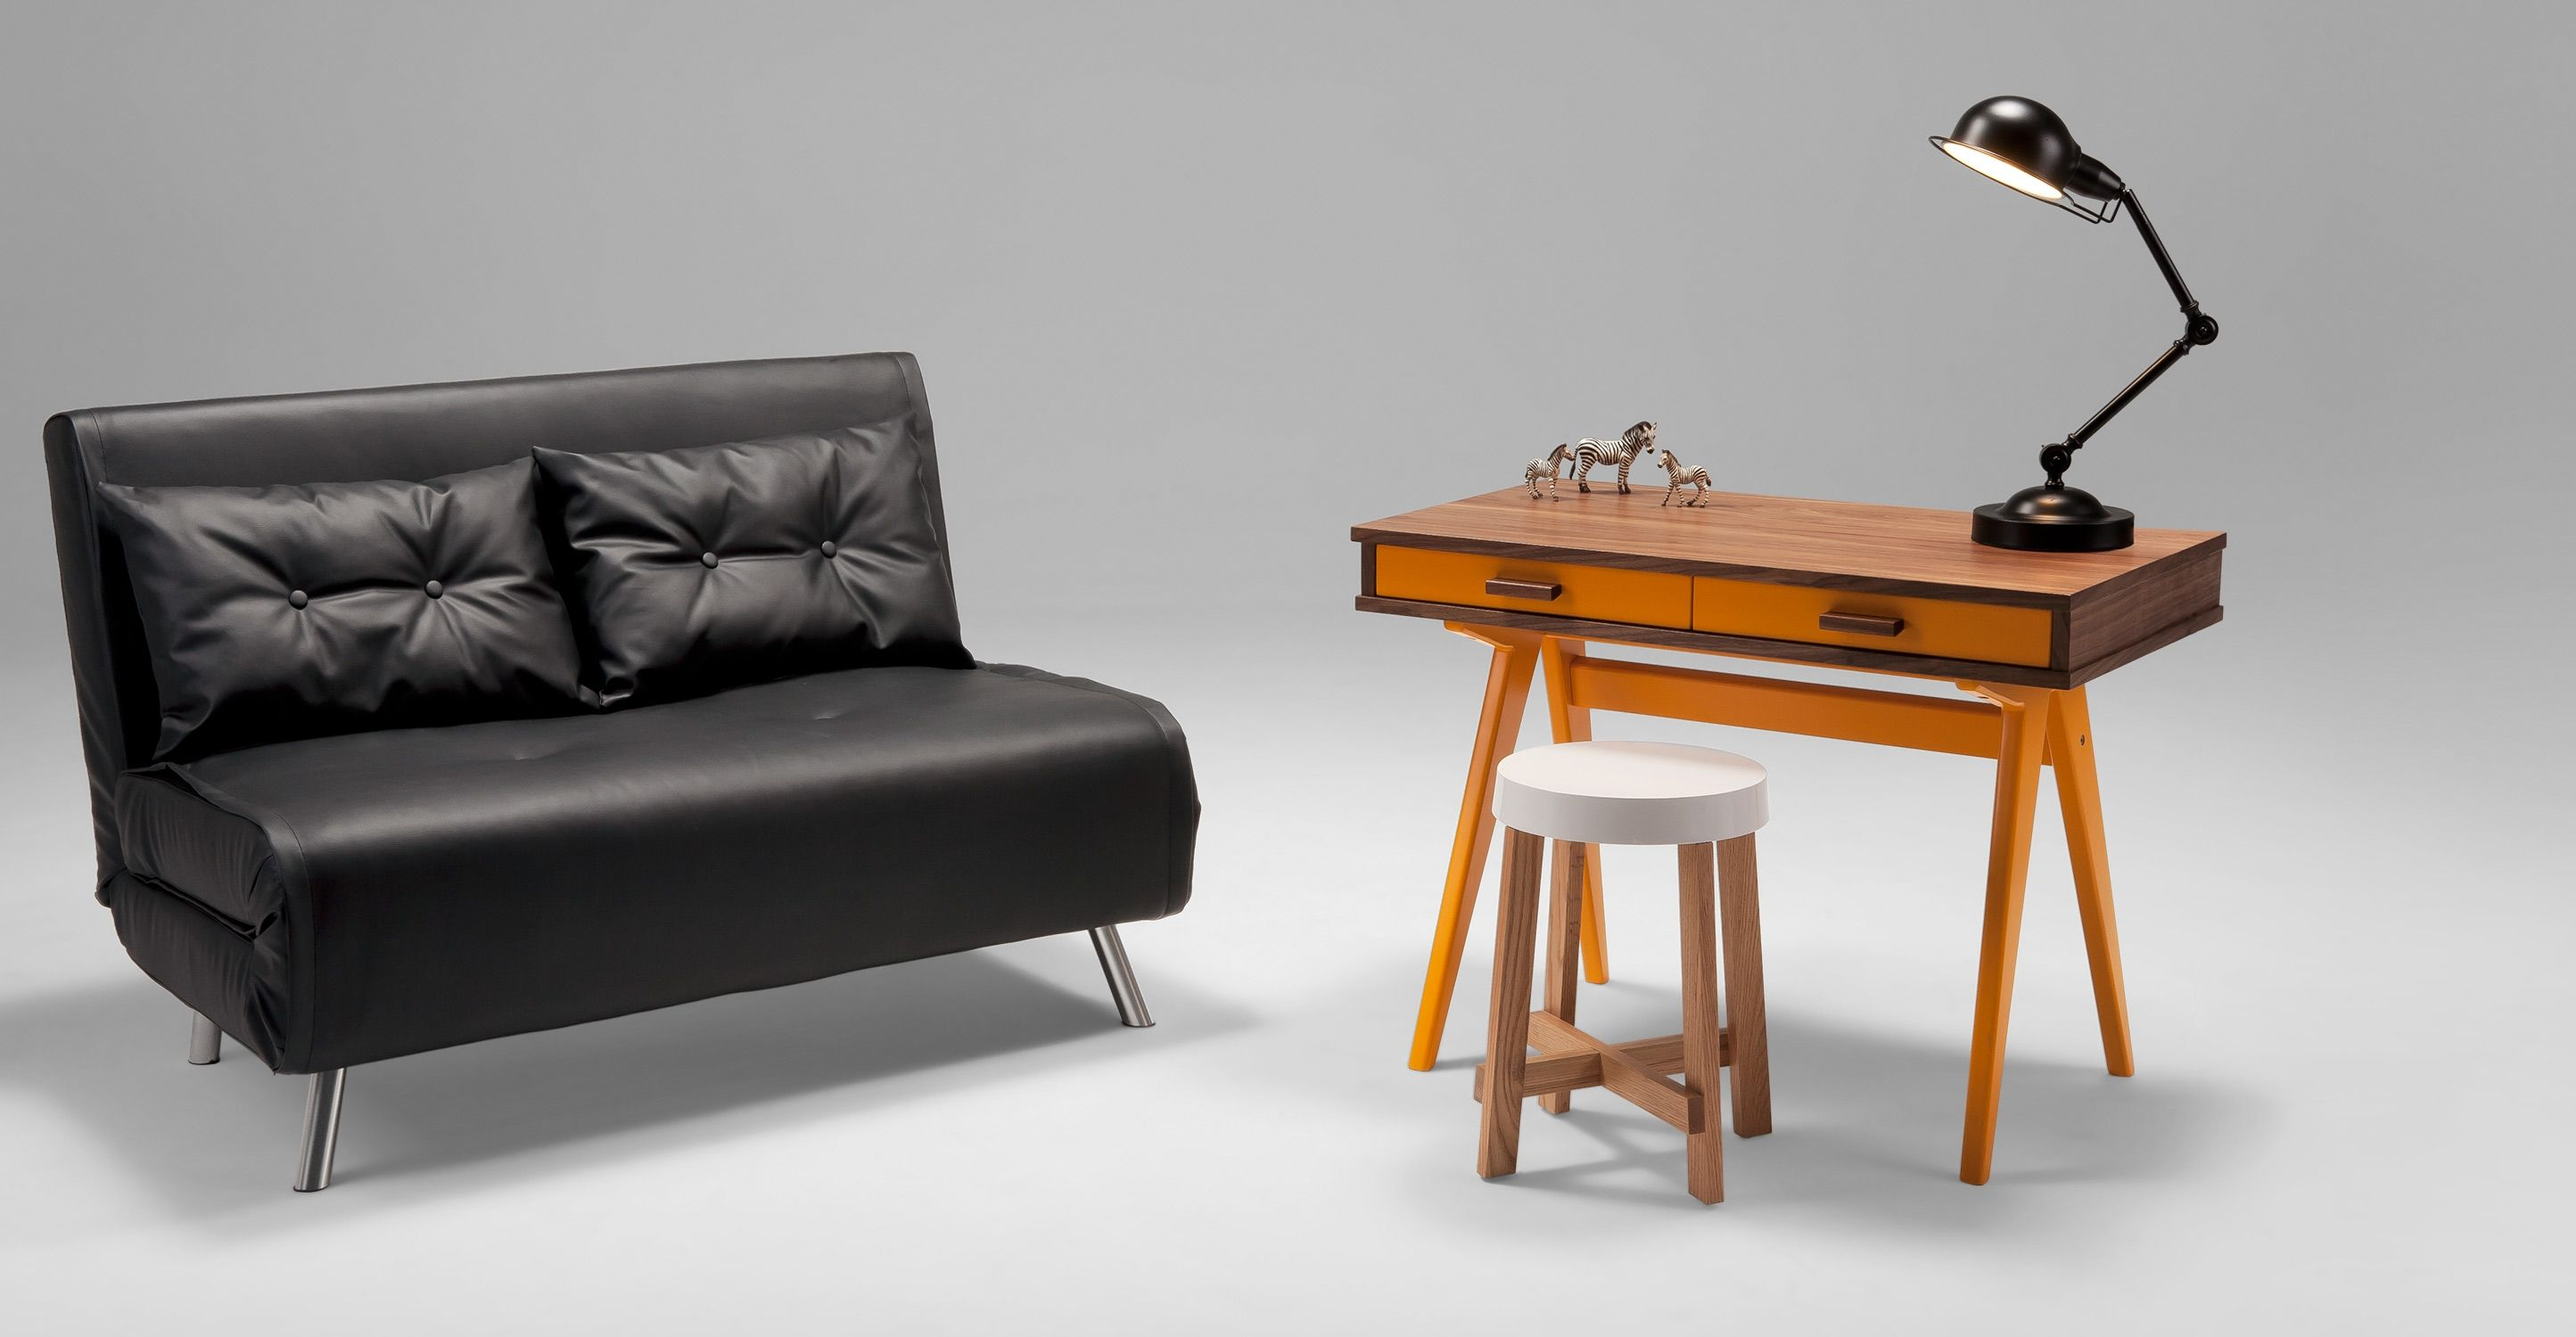 Haru Small Black Sofa Bed Made